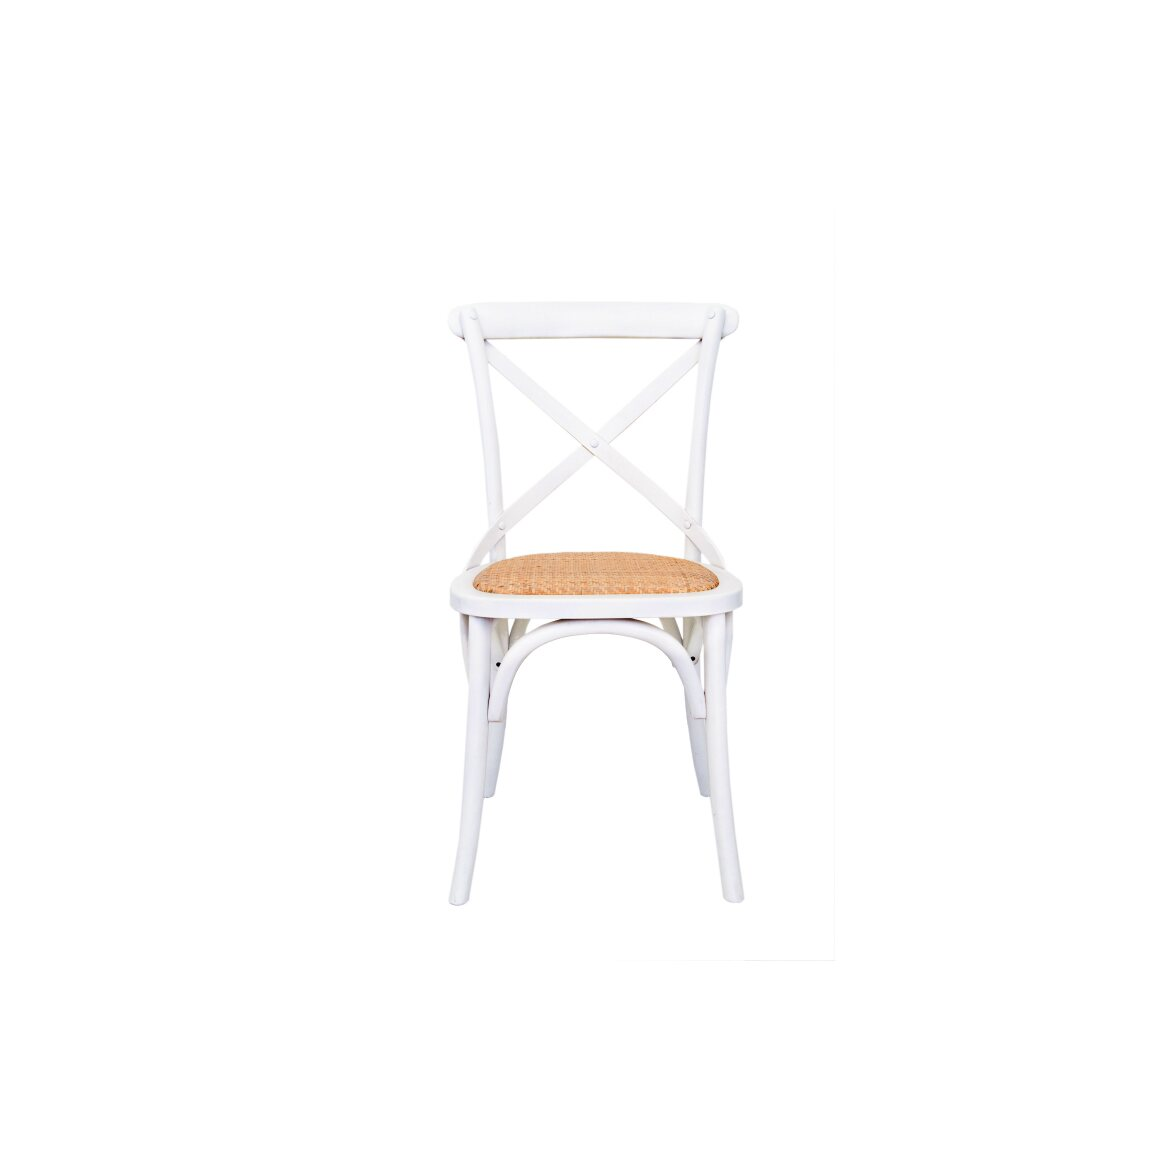 Стул Cross back white | Обеденные стулья Kingsby